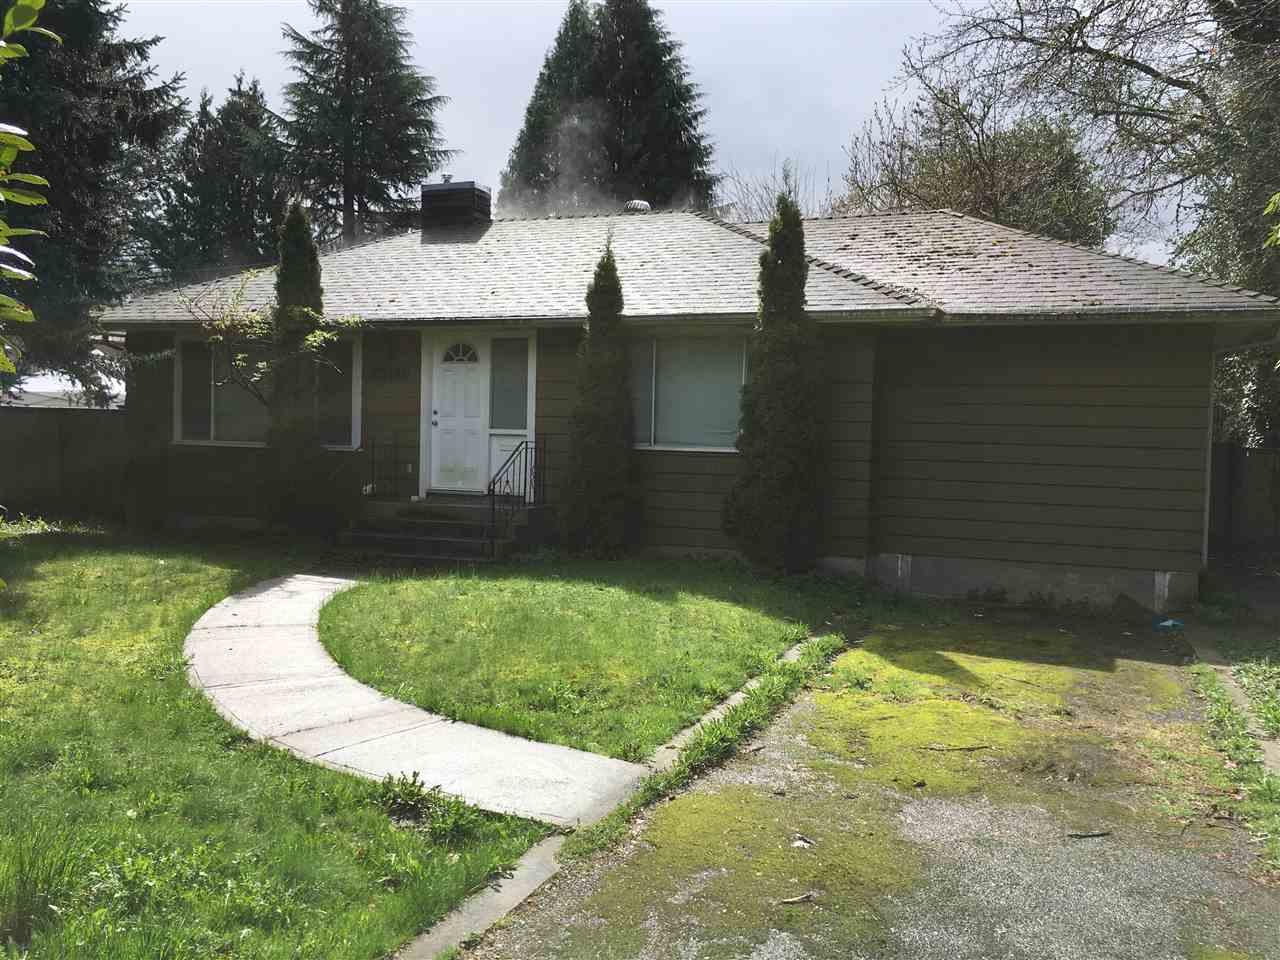 22146 LOUGHEED HIGHWAY, Maple Ridge, BC V2X 2S8